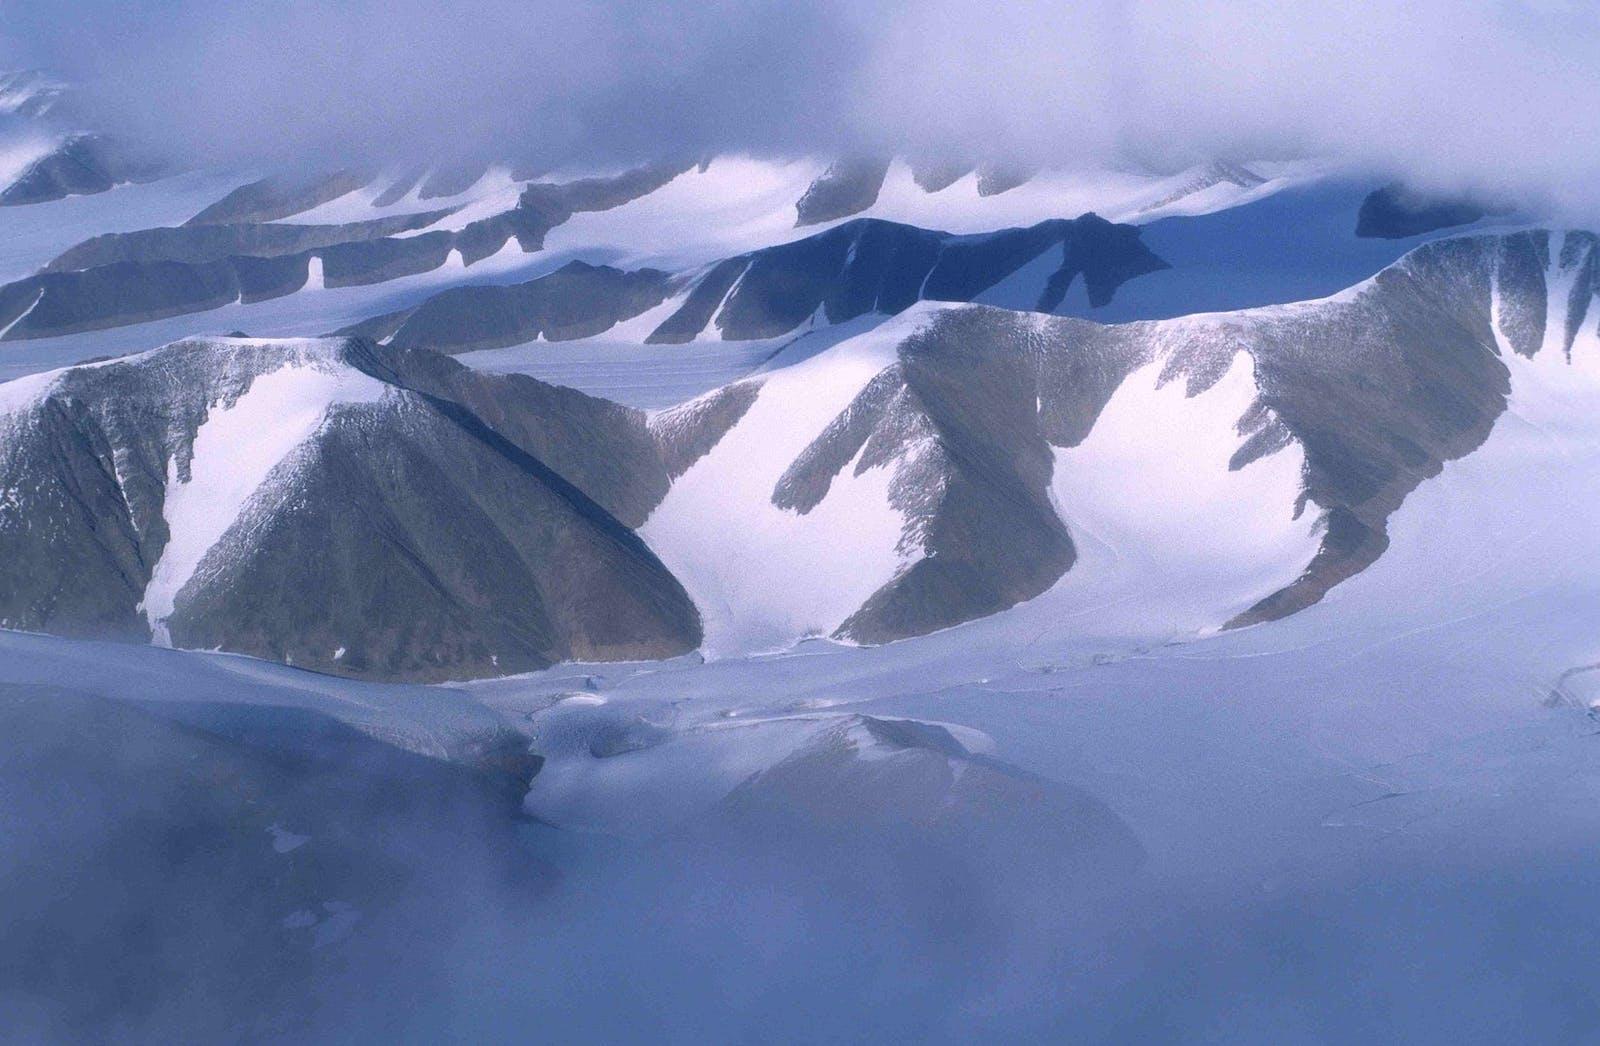 Davis Highlands Tundra